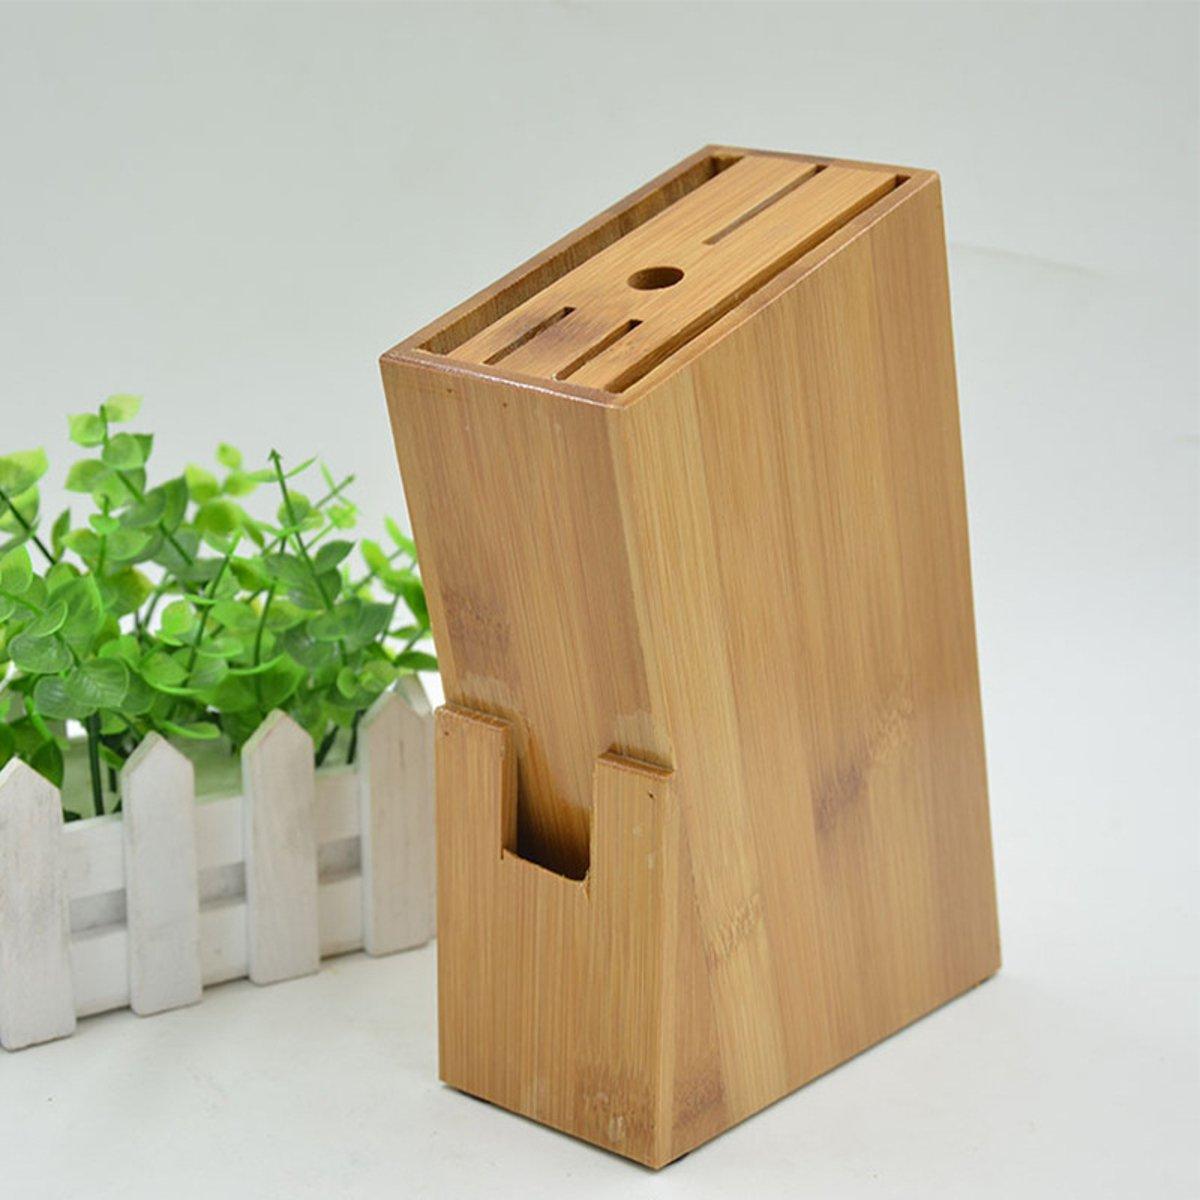 155x63x220mm Bamboo Knife Block Holder Cutlery Storage Box Kitchen Scissors Tools Organizer Kitchen Knives Accessories Shelf